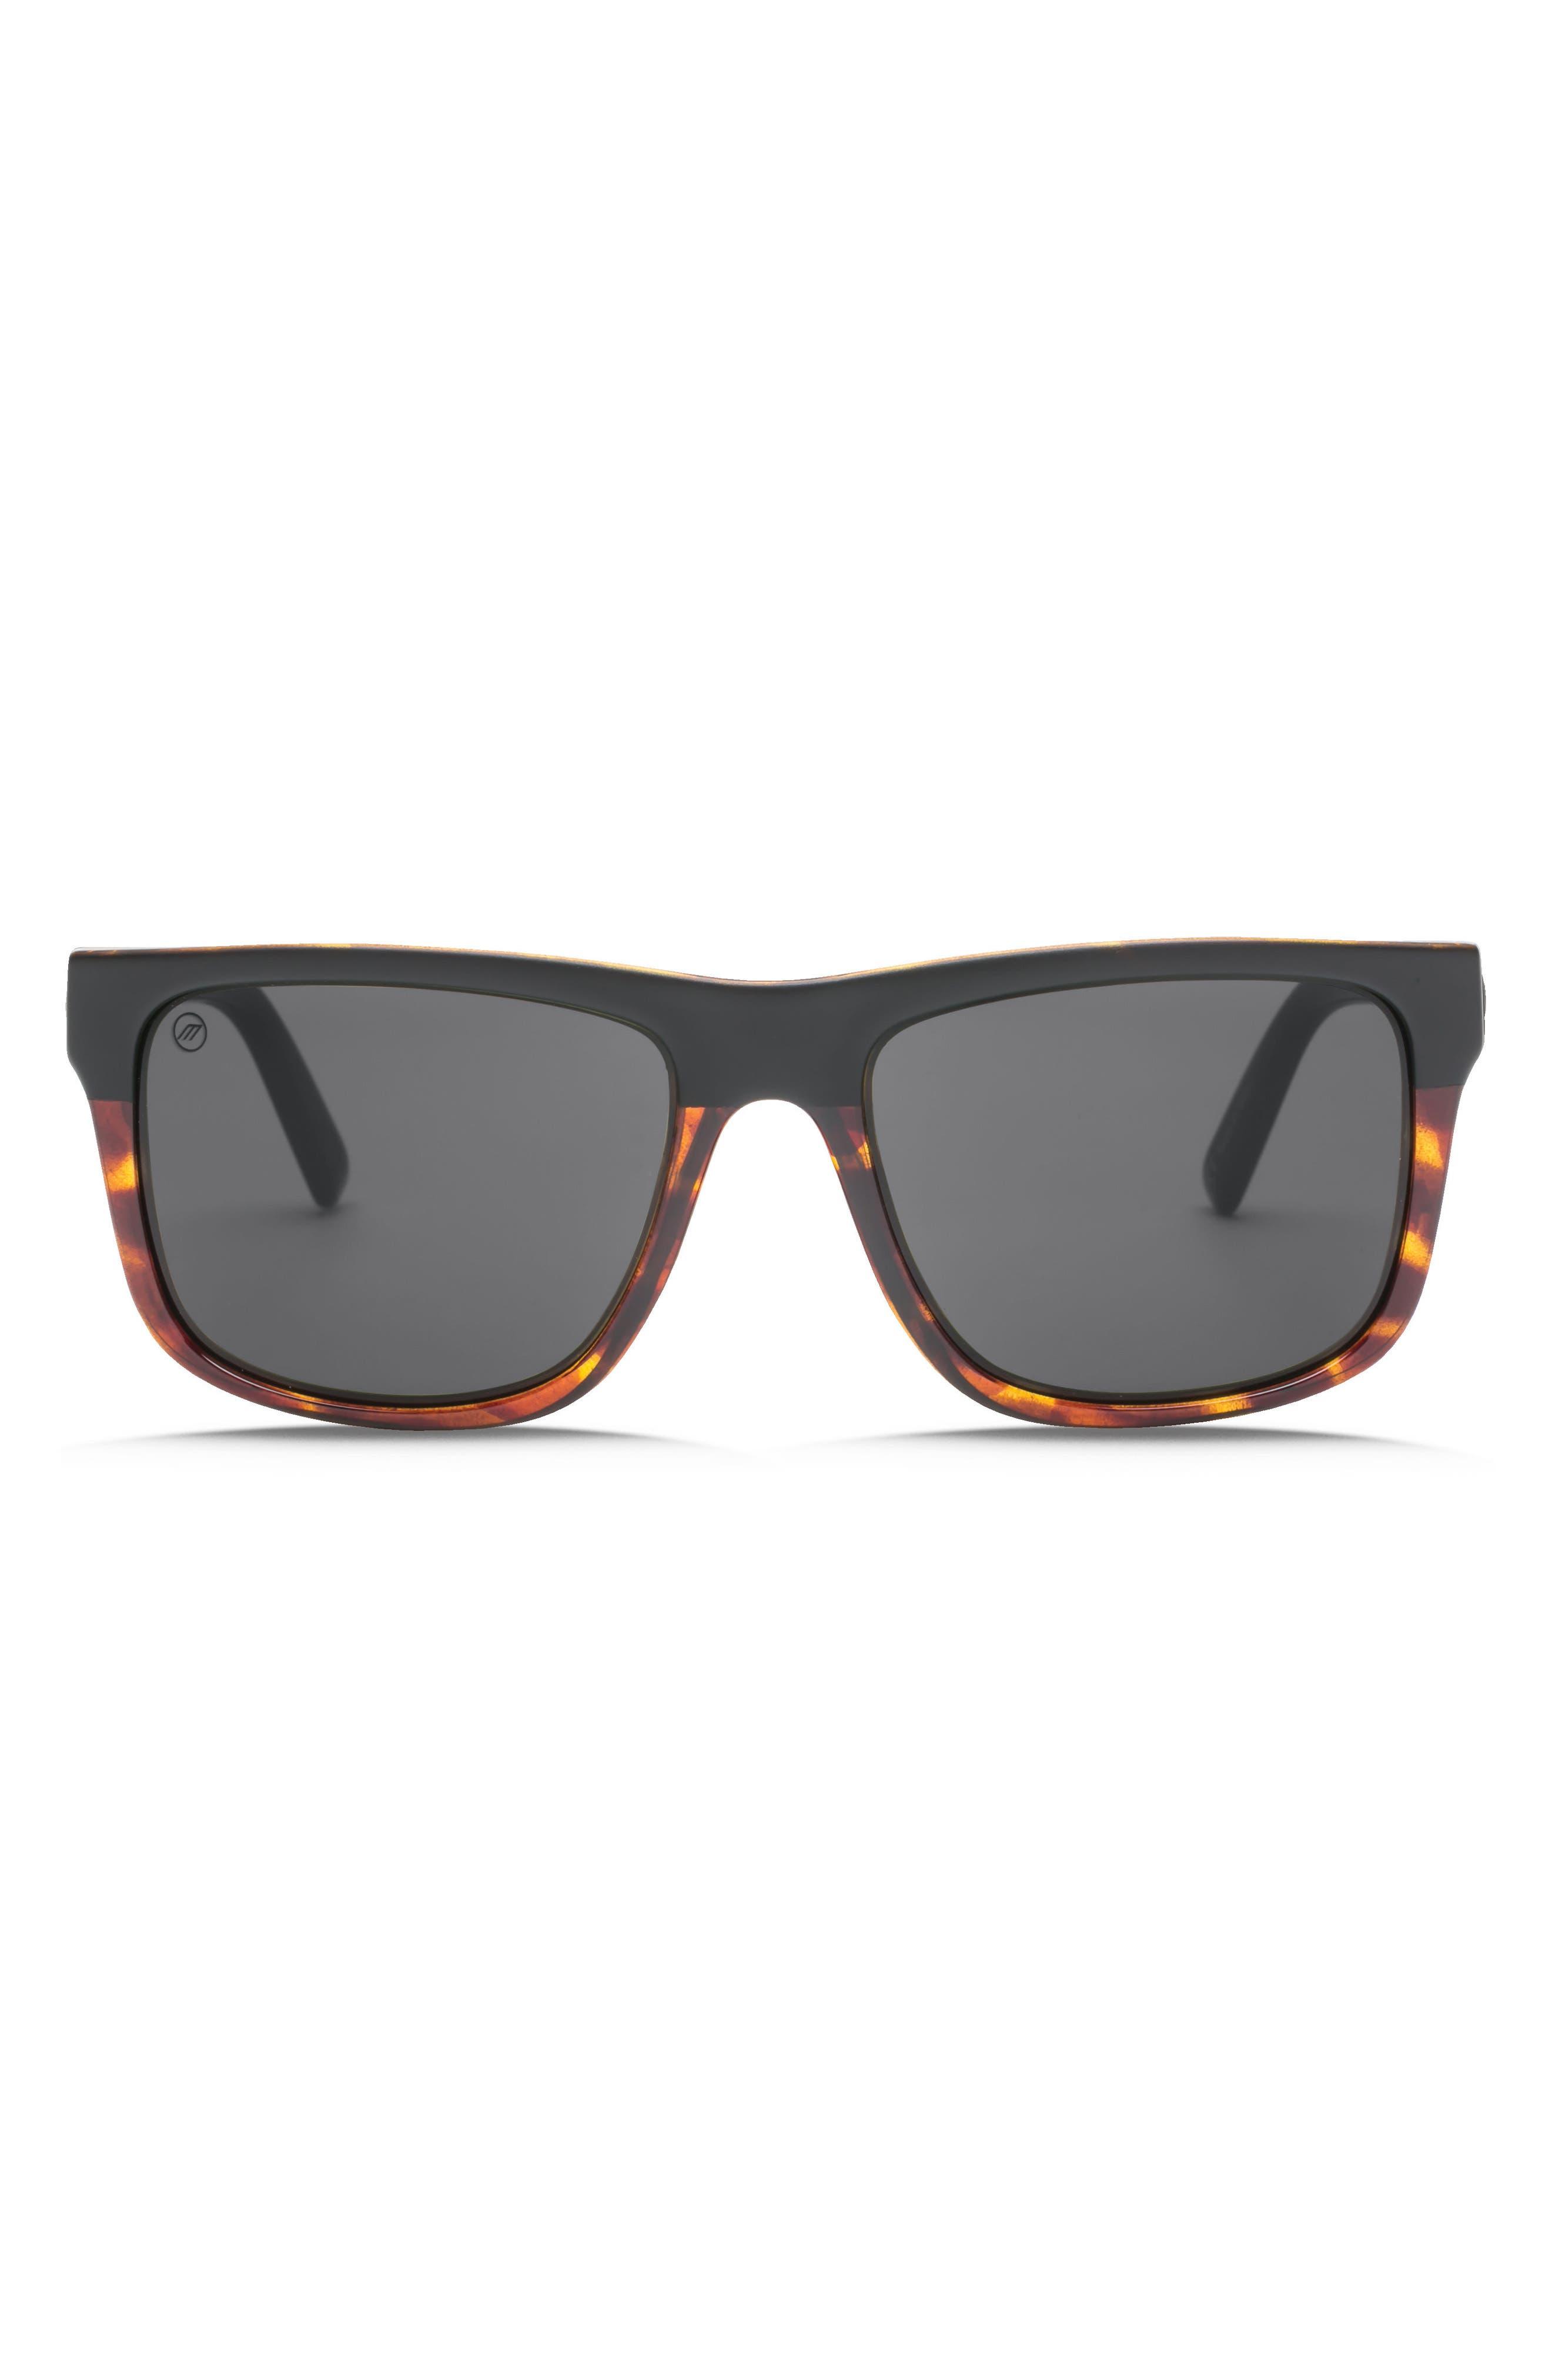 Swingarm XL 59mm Sunglasses,                         Main,                         color, DARKSIDE TORTOISE/ GREY